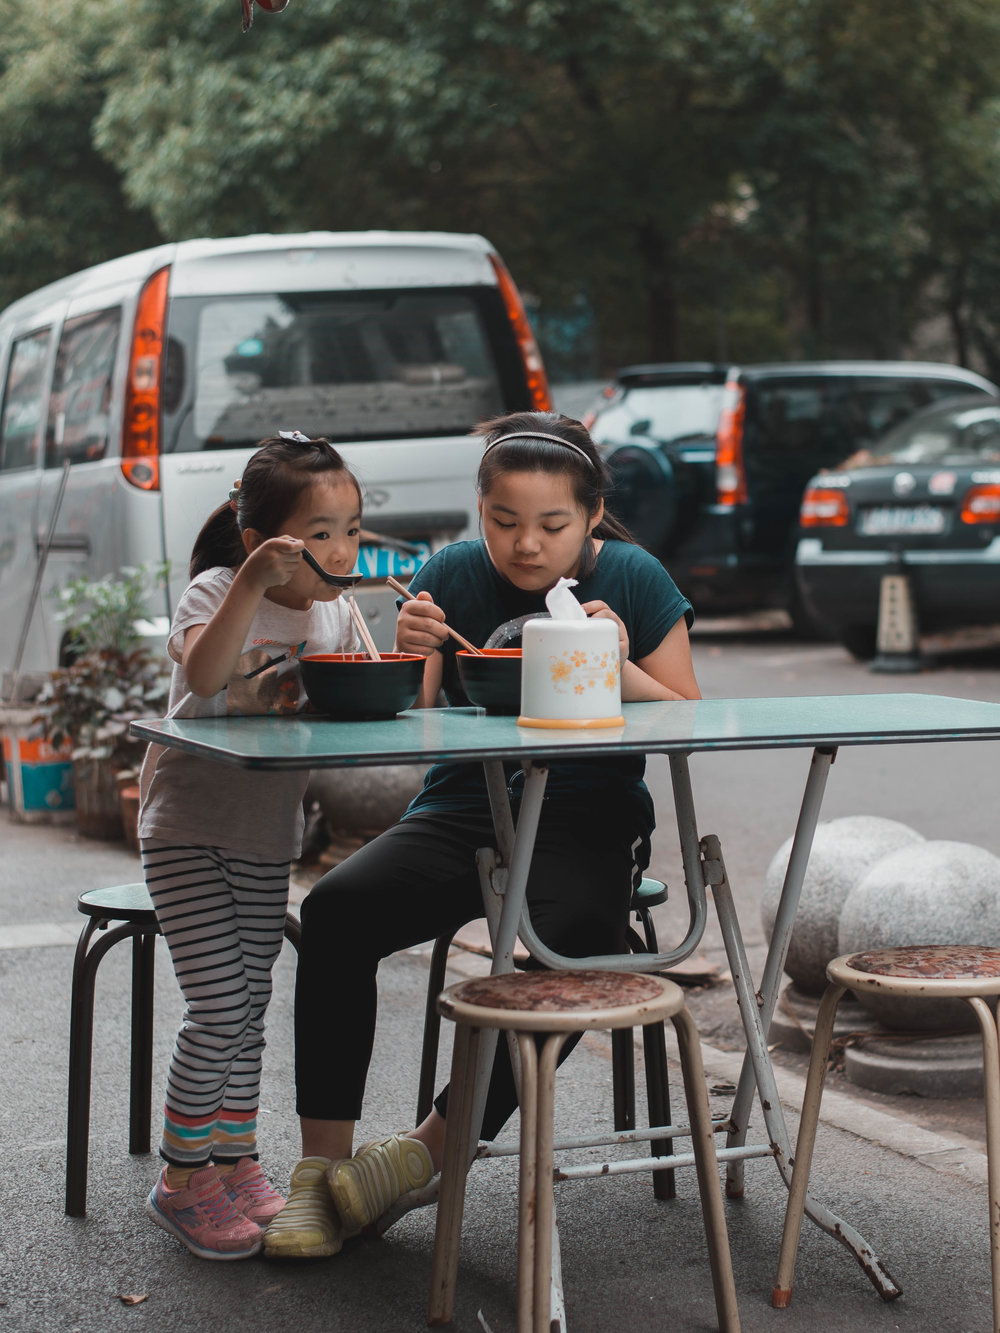 Two Nanjing locals eating wonton soup